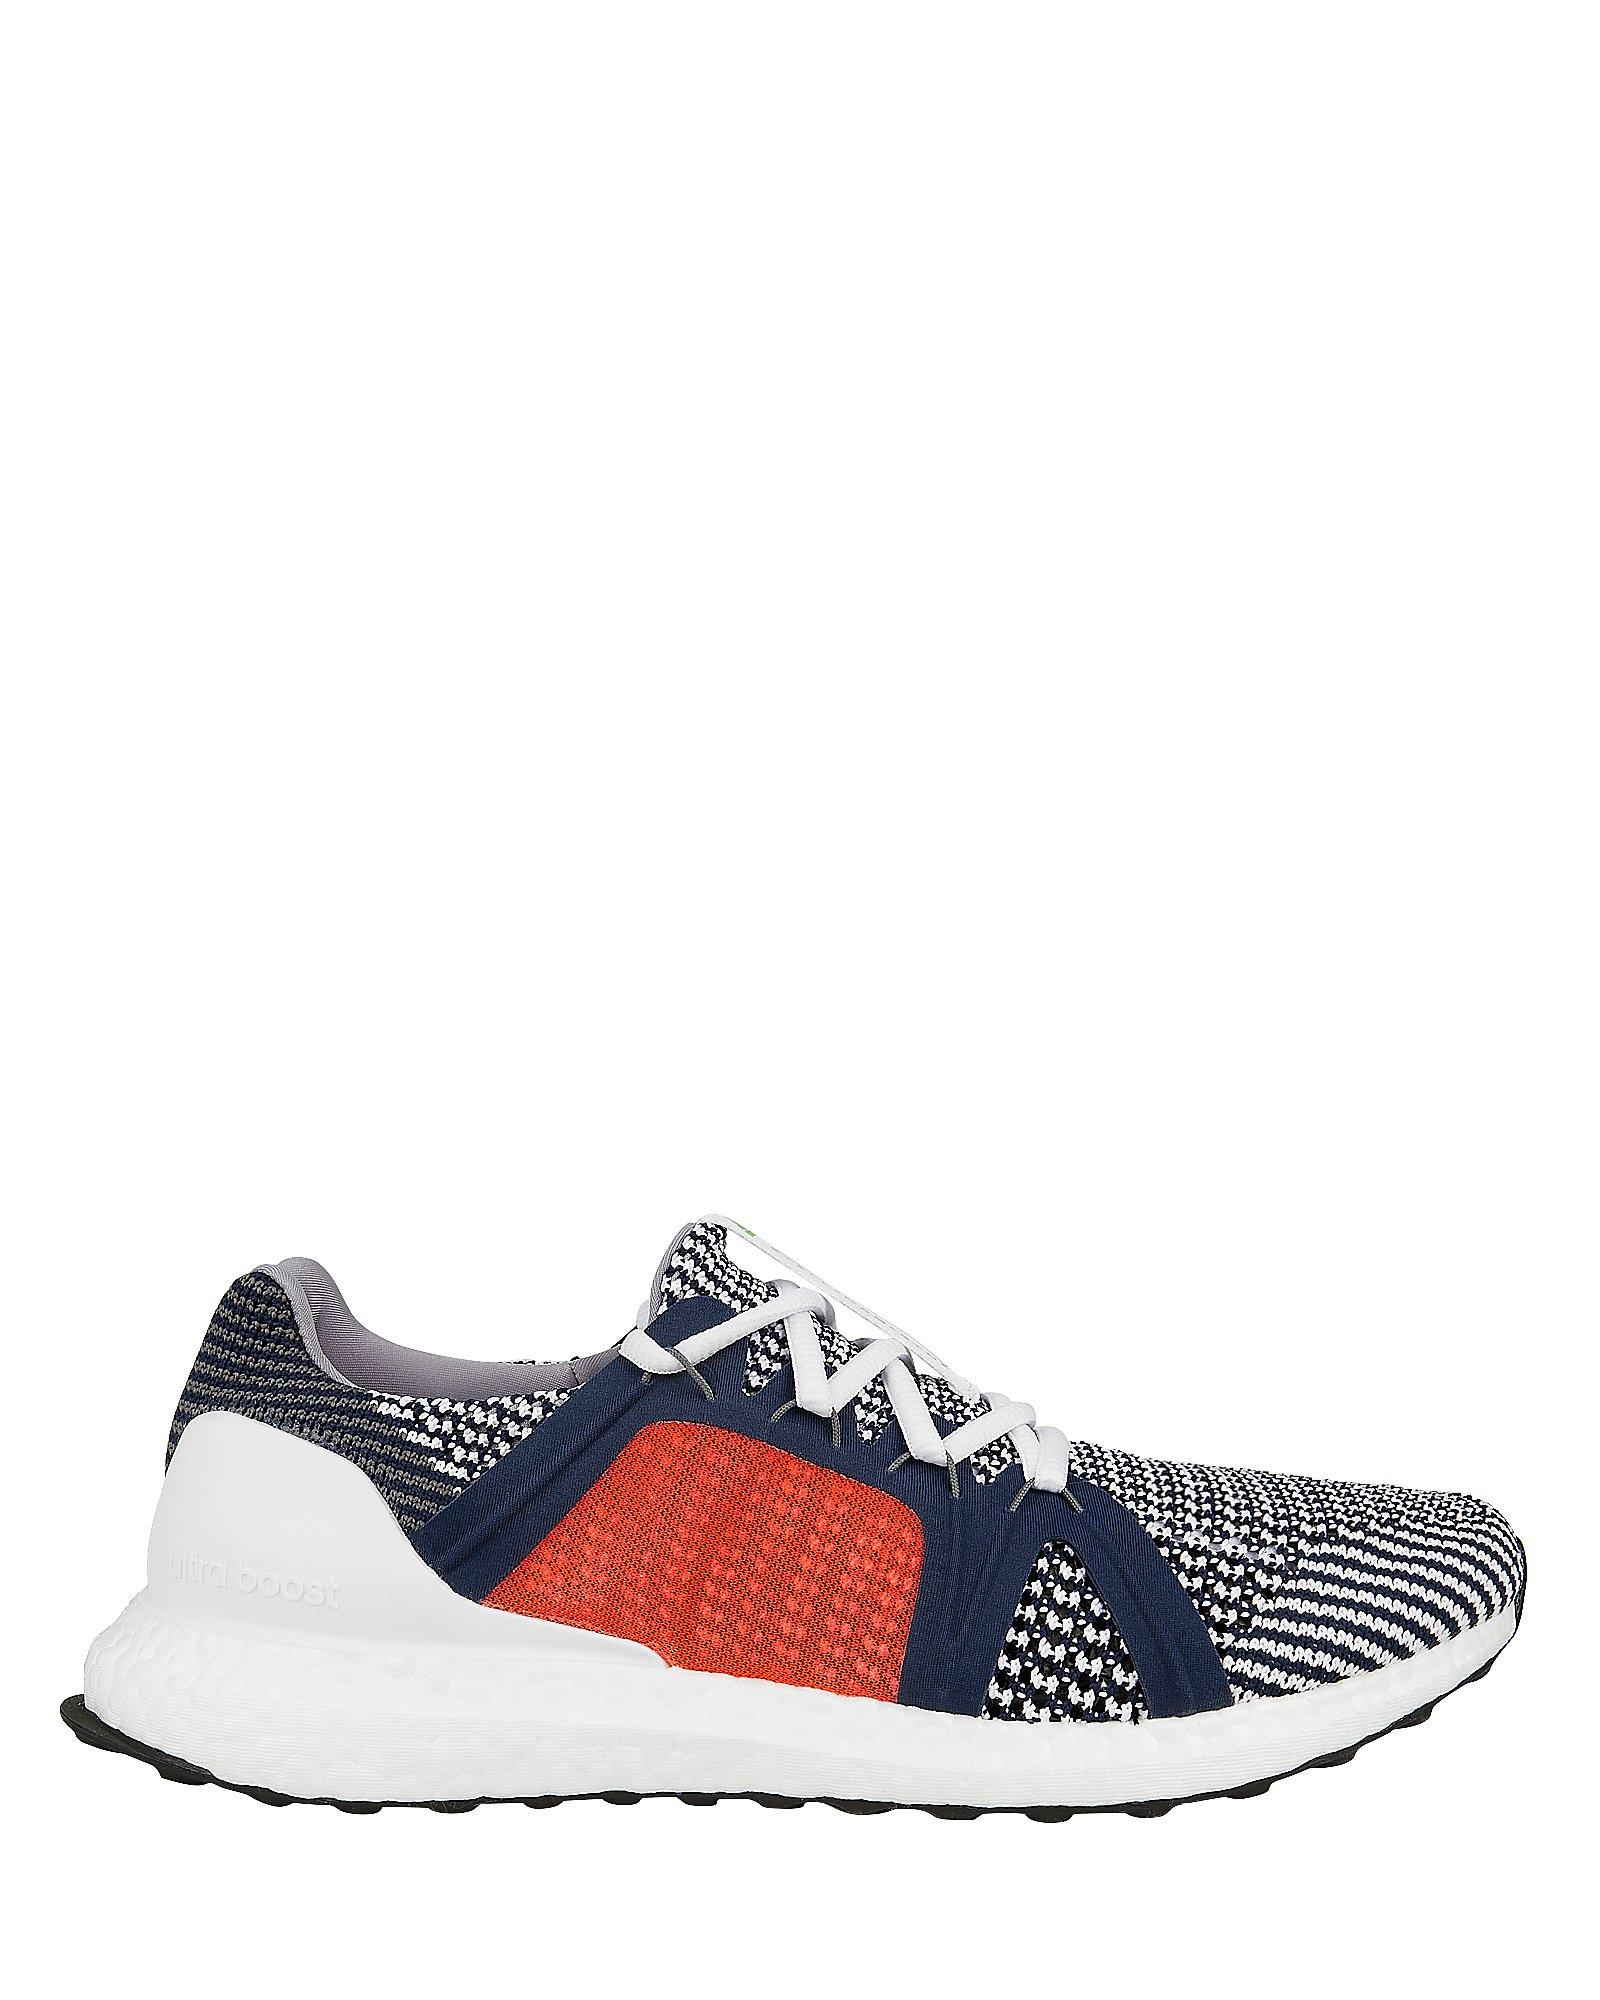 2123690460e Lyst - adidas By Stella McCartney Ultra Boost Knit Sneakers in Blue